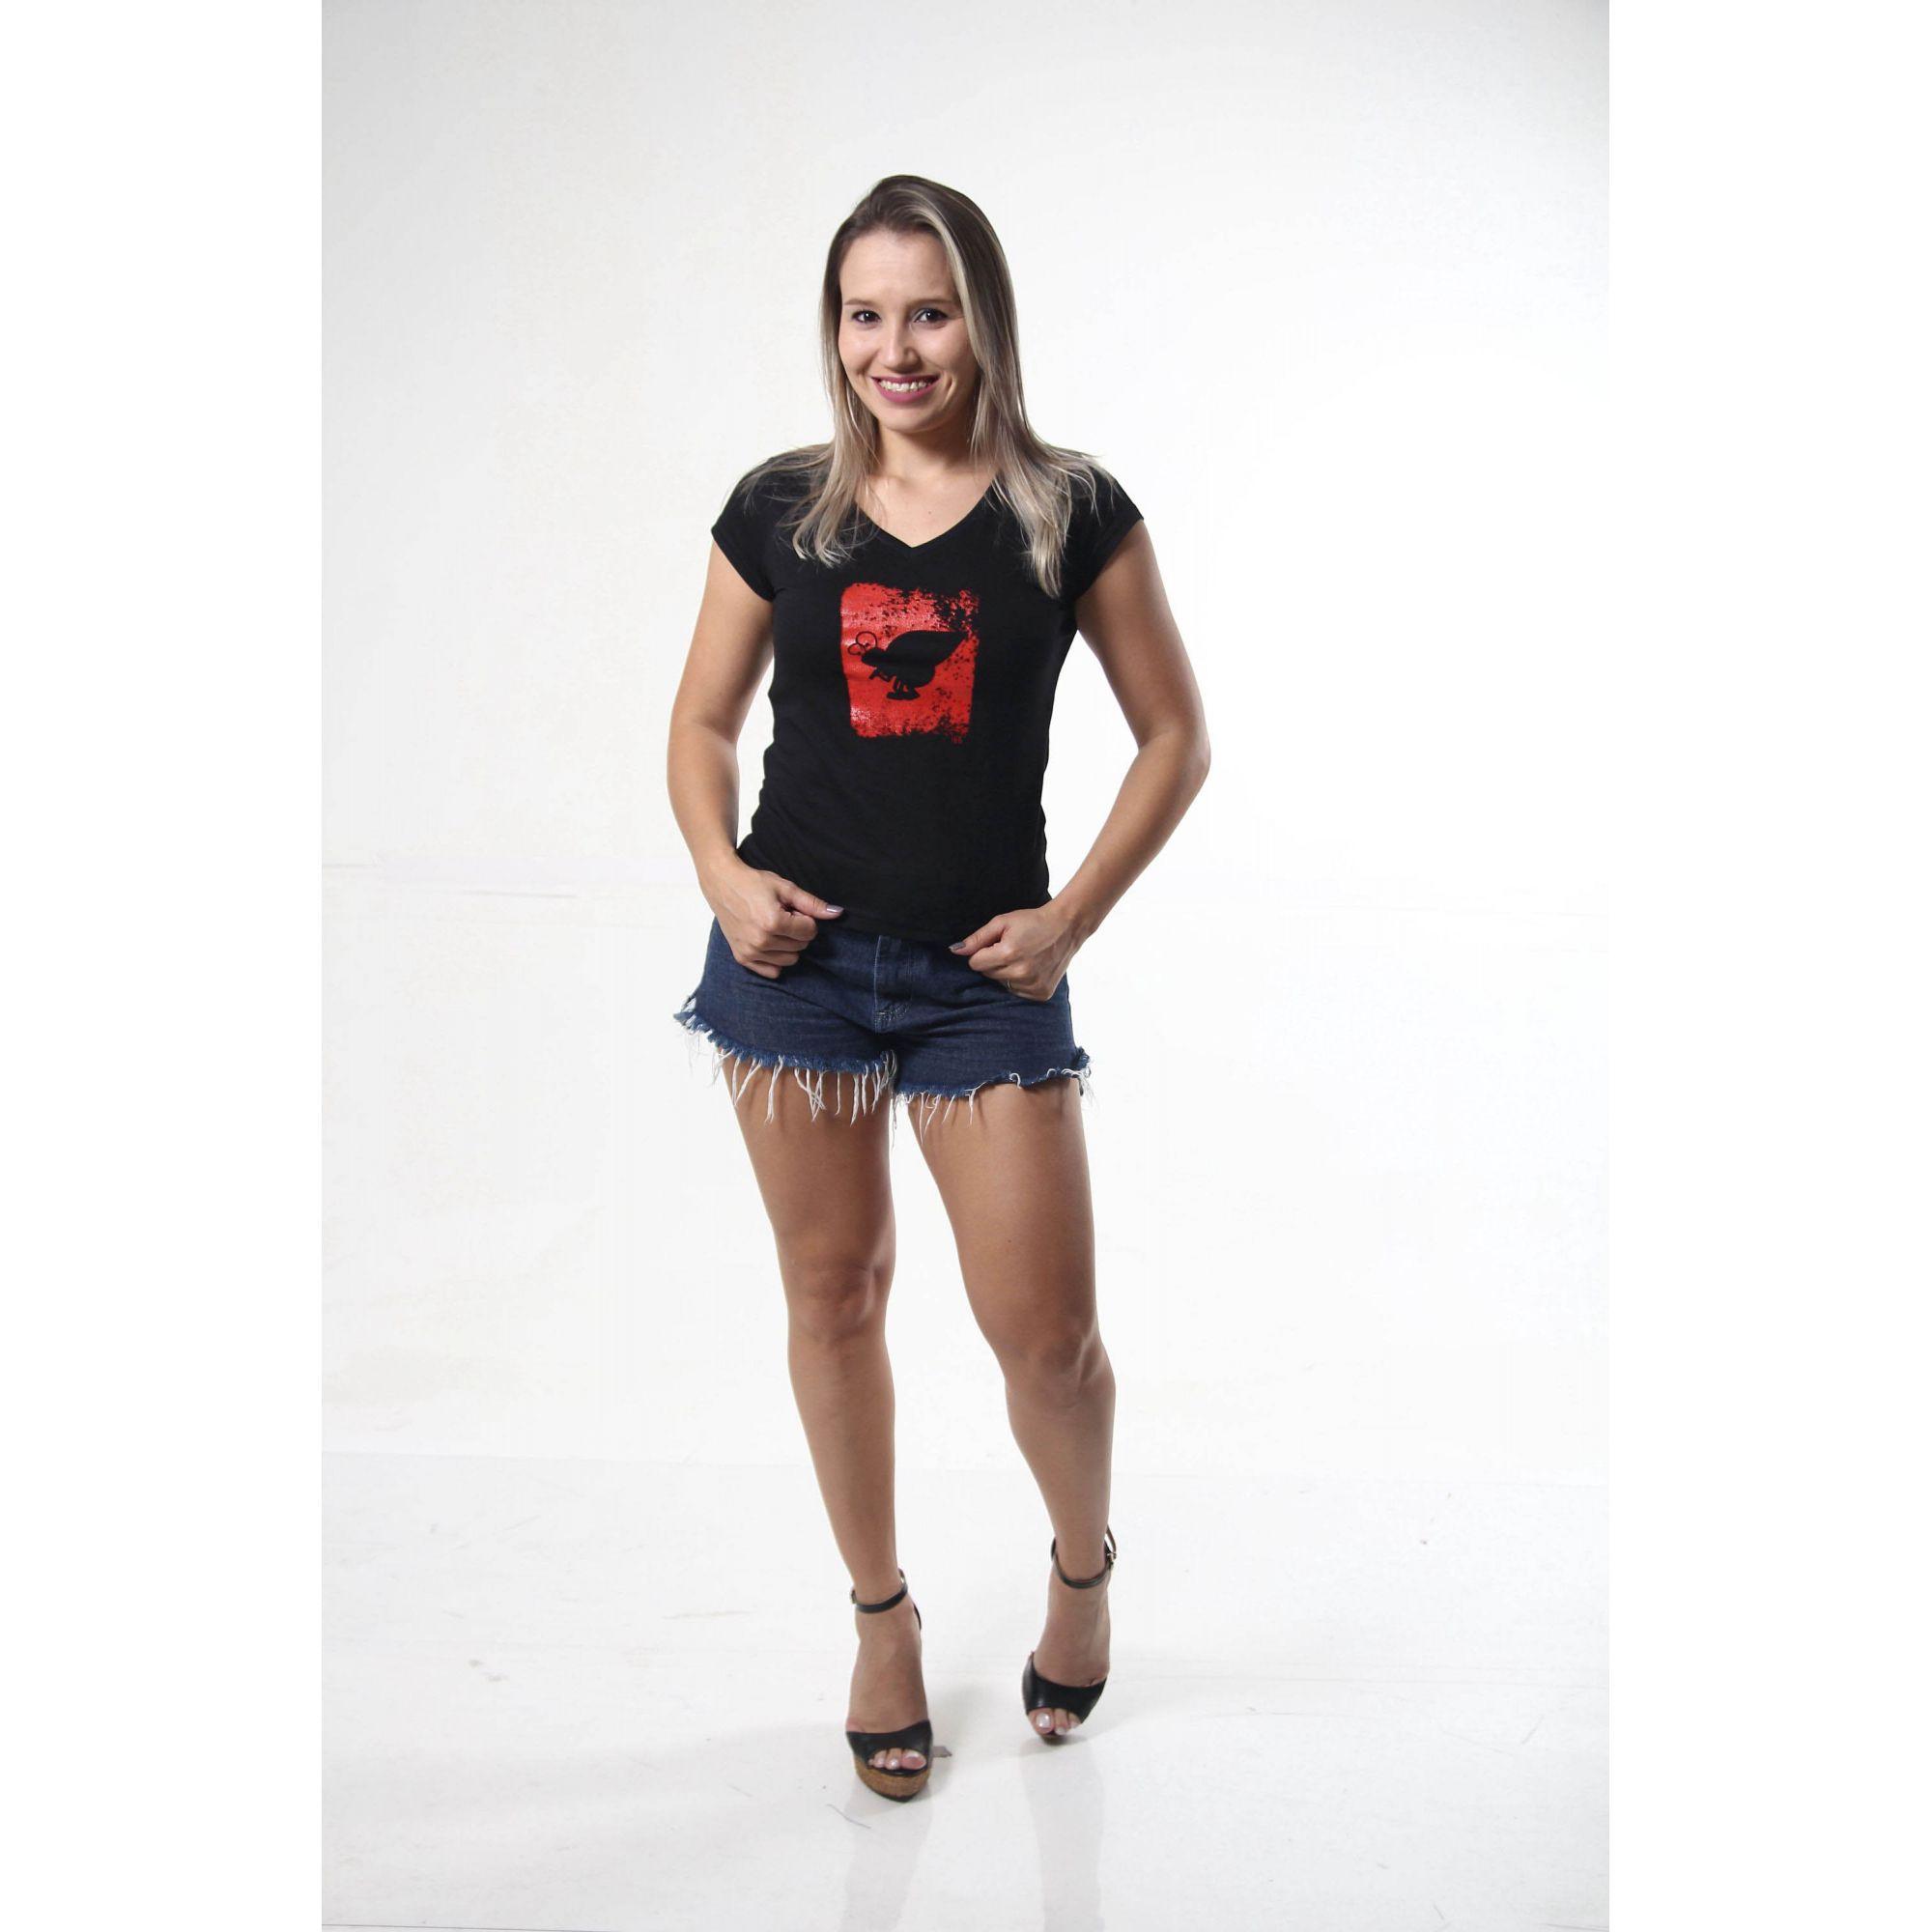 Camiseta Feminina Preta Estampa Emborrachada  - Heitor Fashion Brazil